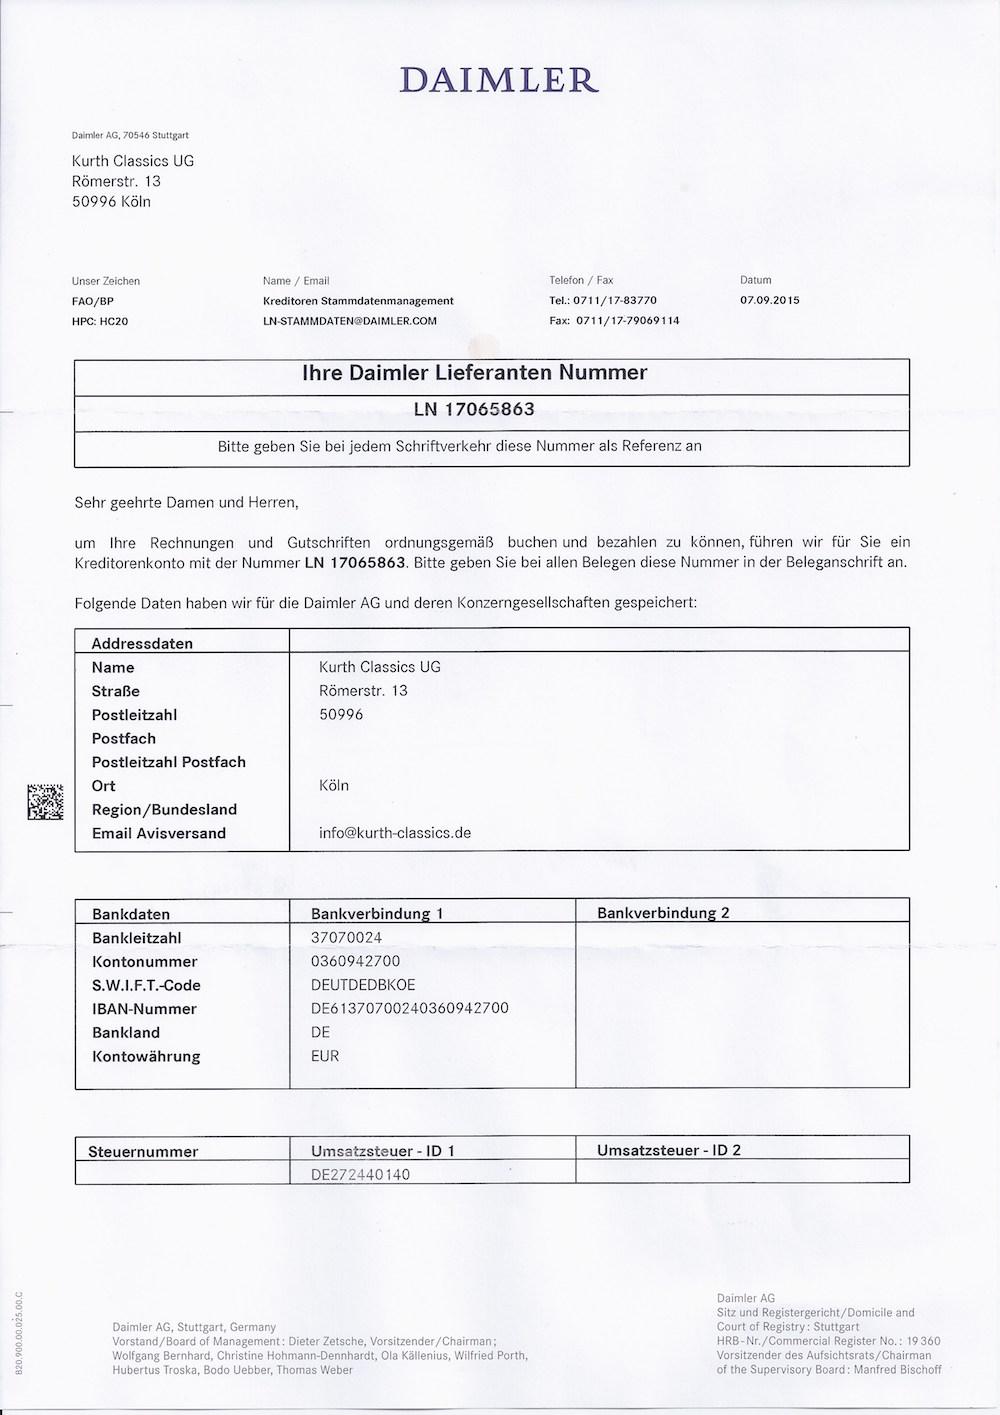 Kabelbaum | KURTH CLASSICS I Oldtimer & Youngtimer Spezialist